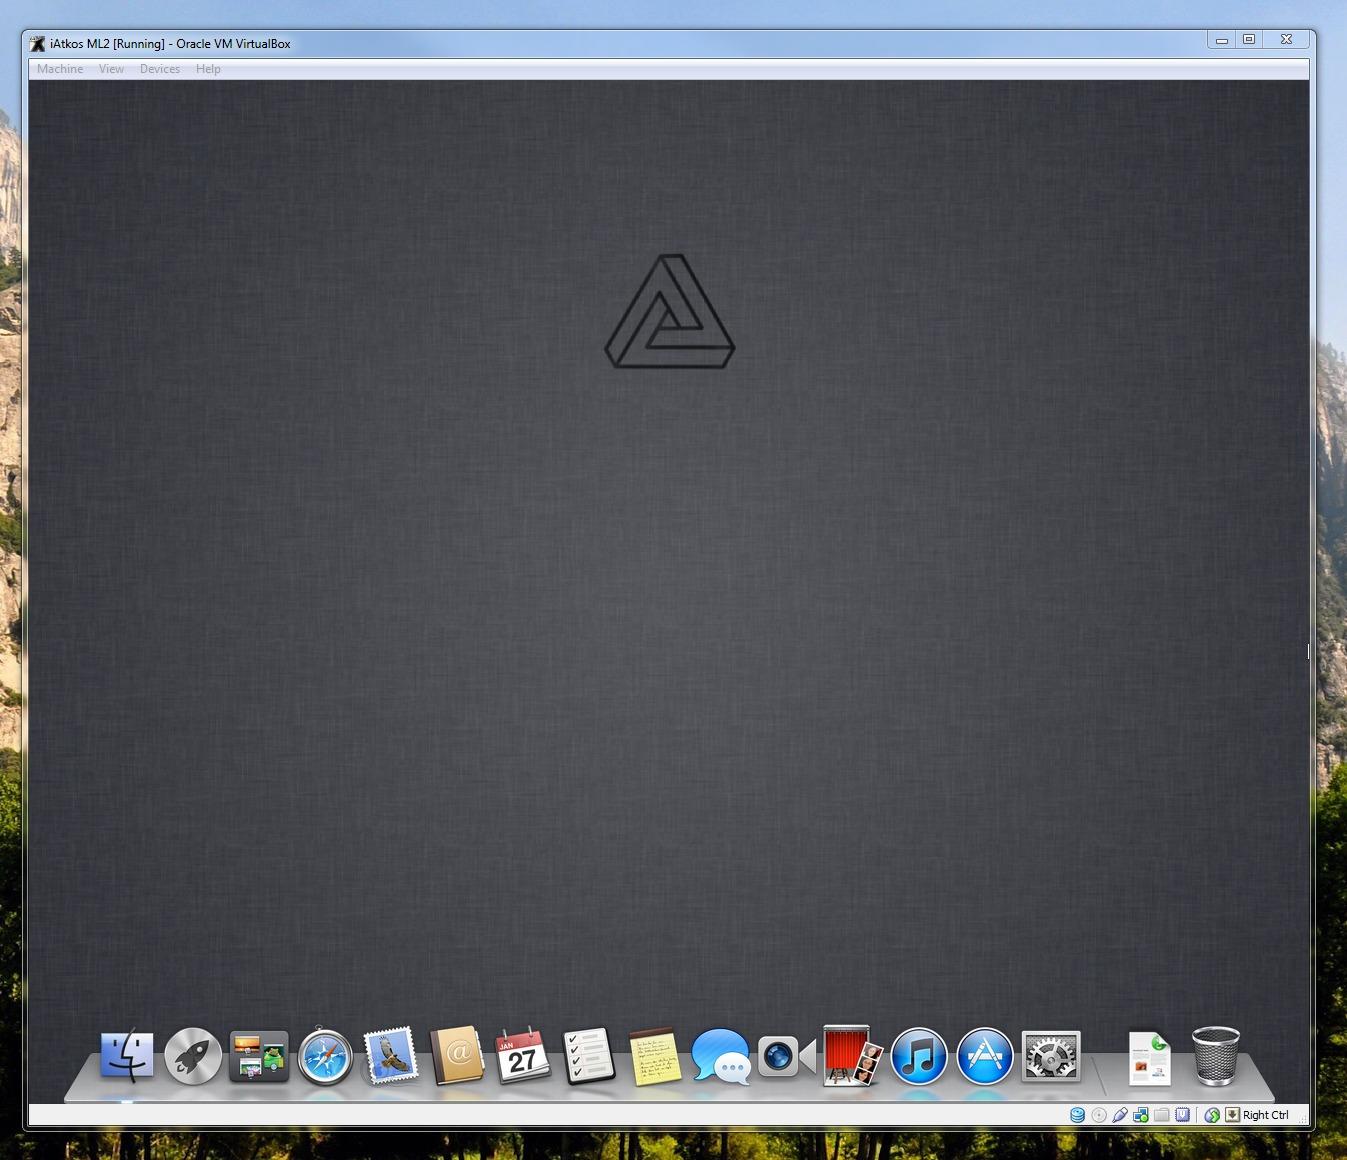 HP ProBook - Mavericks